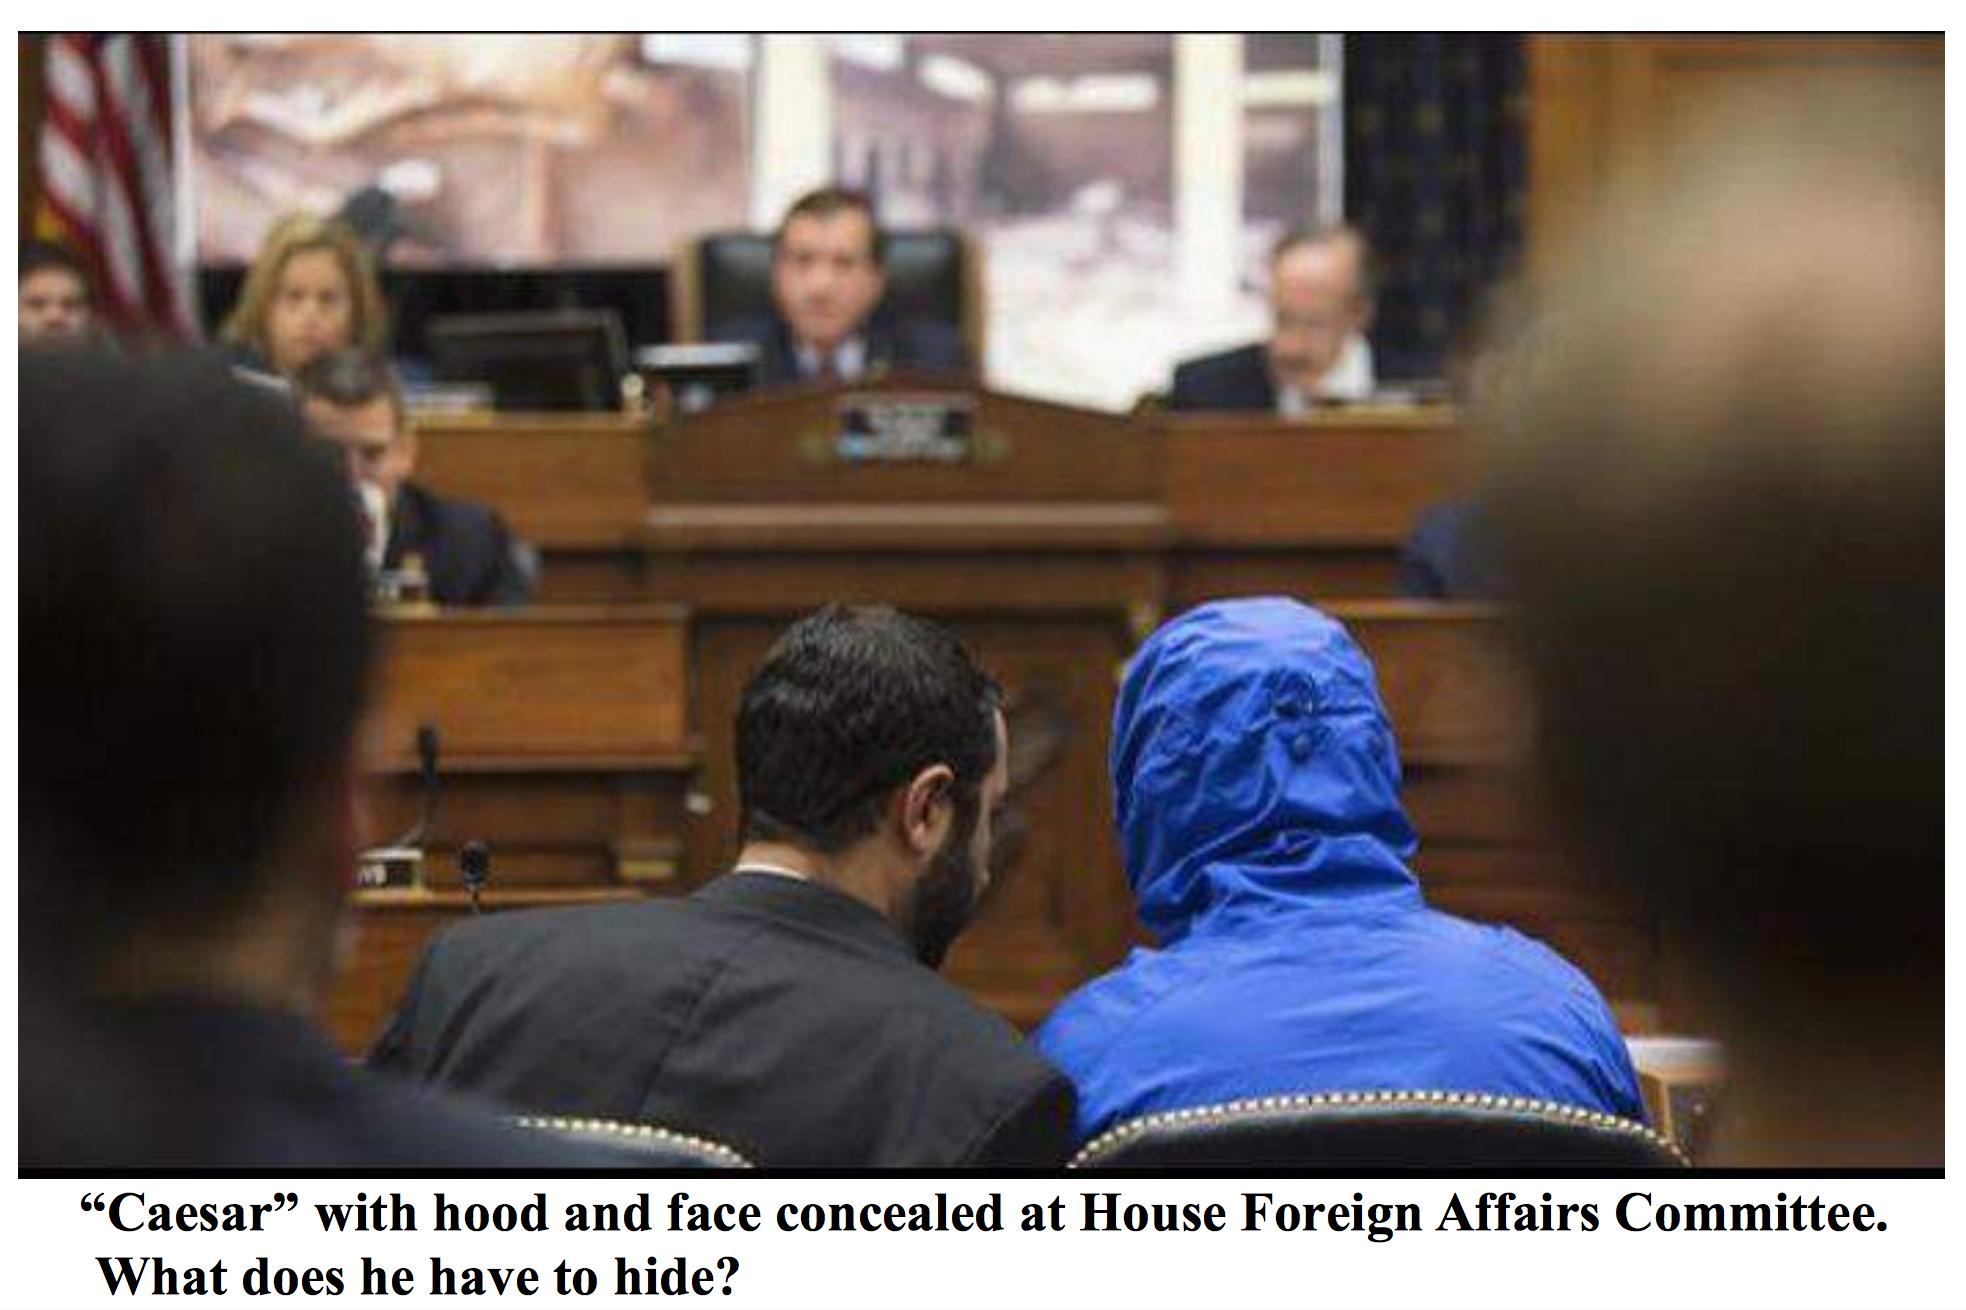 Afbeeldingsresultaat voor Caesar amnesty syria report fake